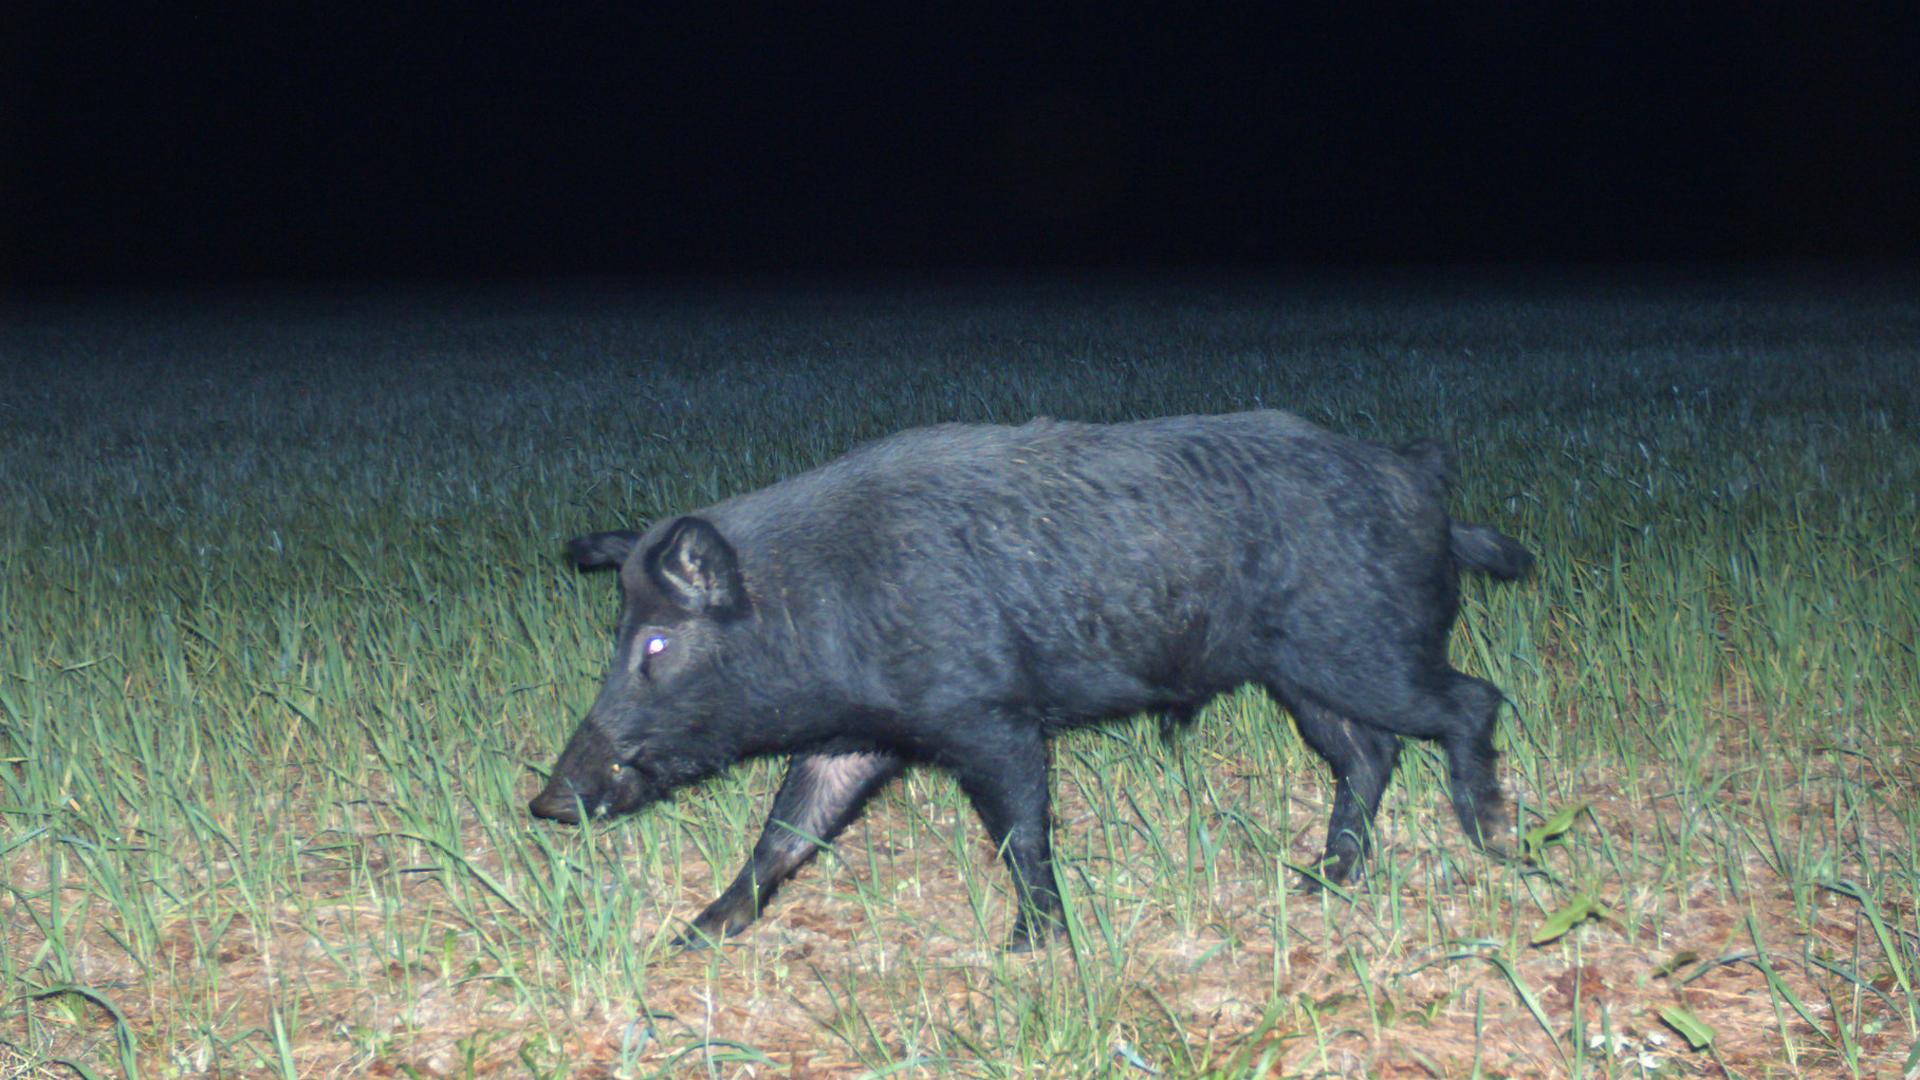 Feral hog pictured on Nov. 25, 2019. (Credit: Florida Fish and Wildlife/Flickr)